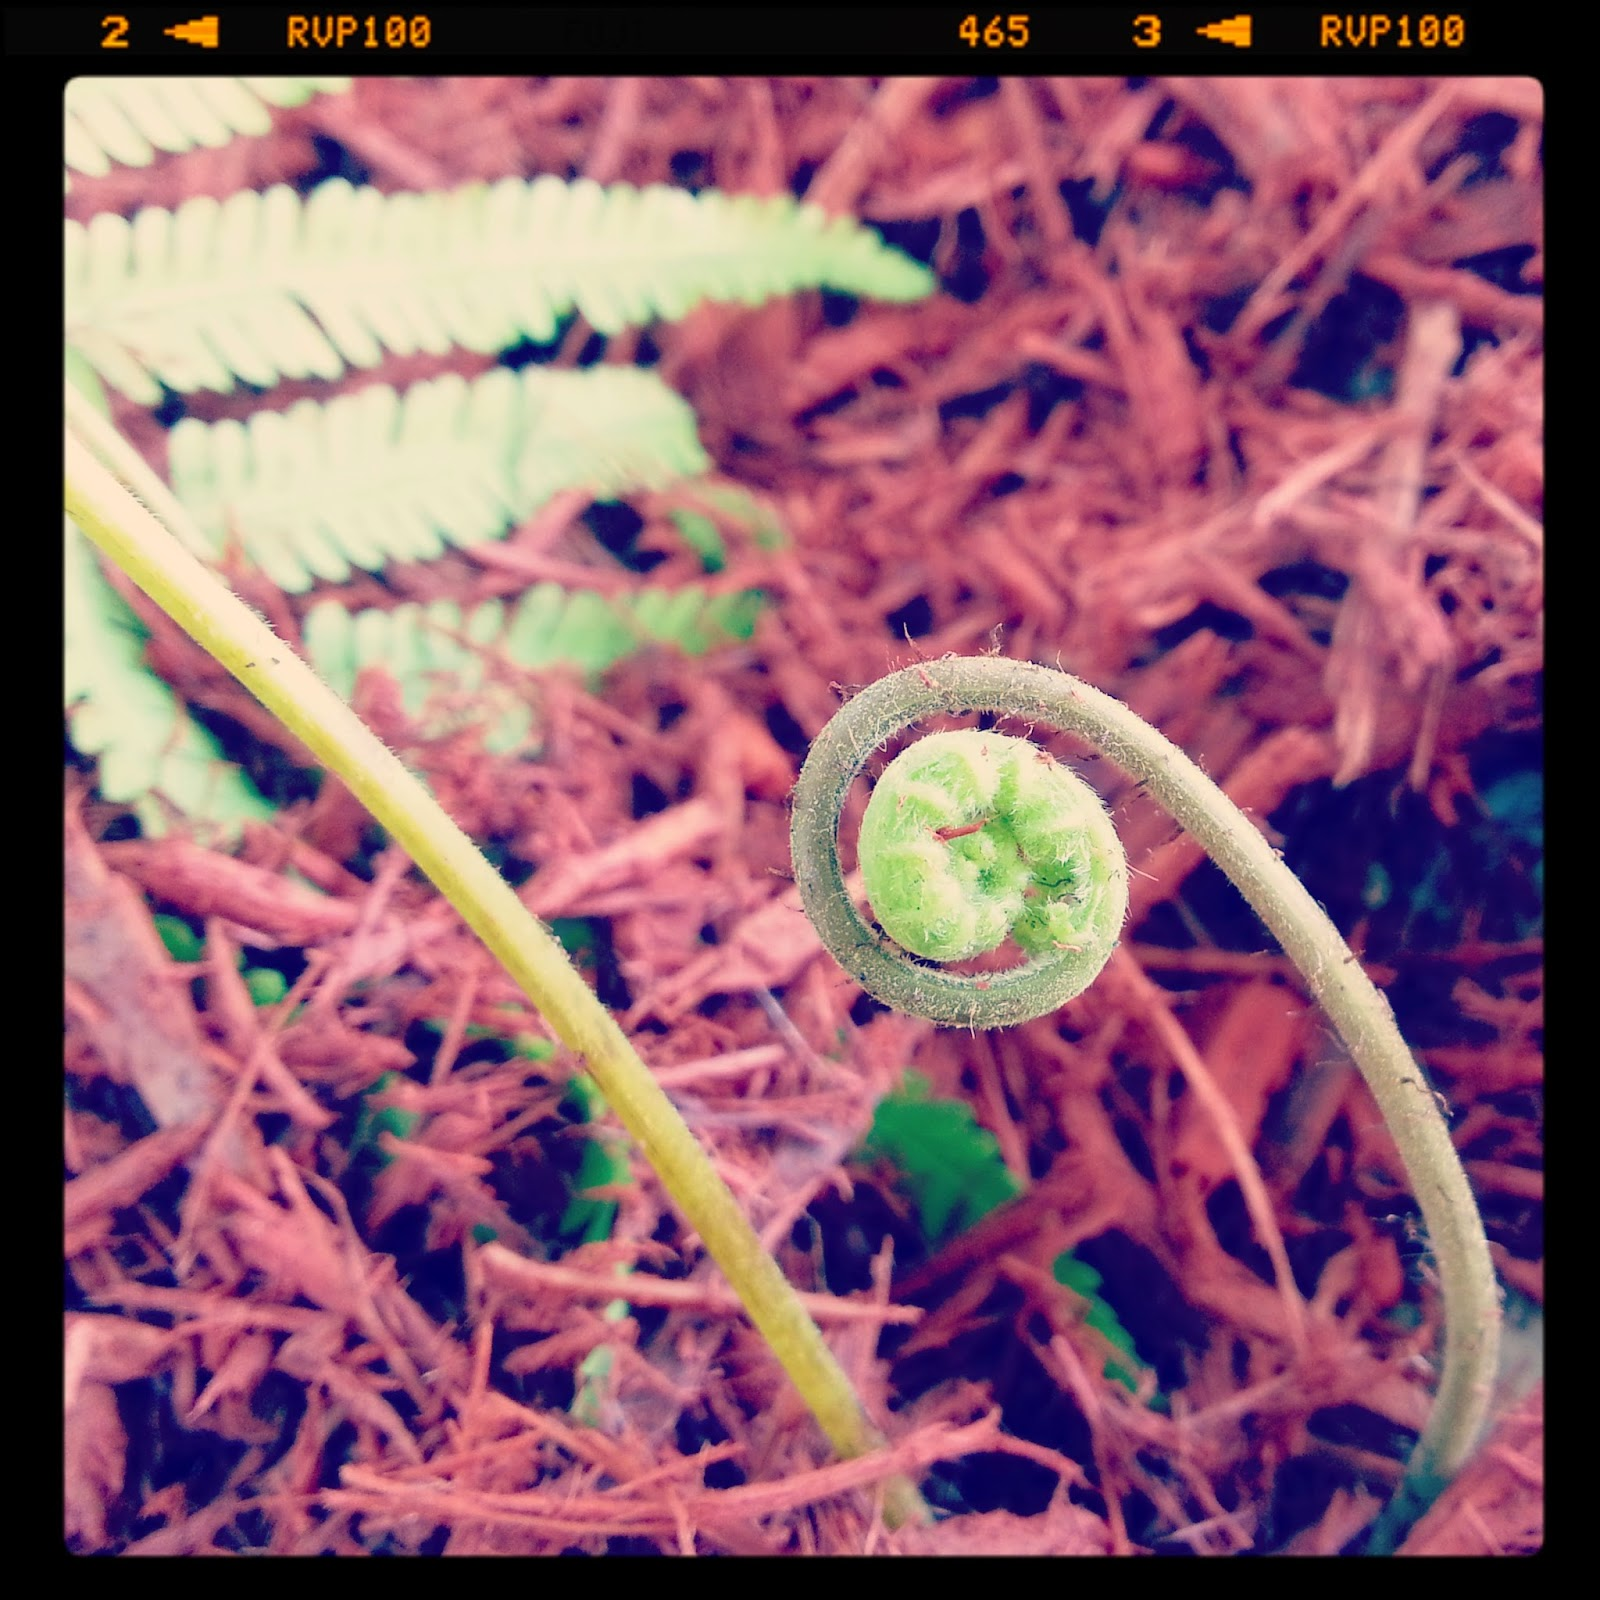 http://instagram.com/p/m_XXI_N7LY/